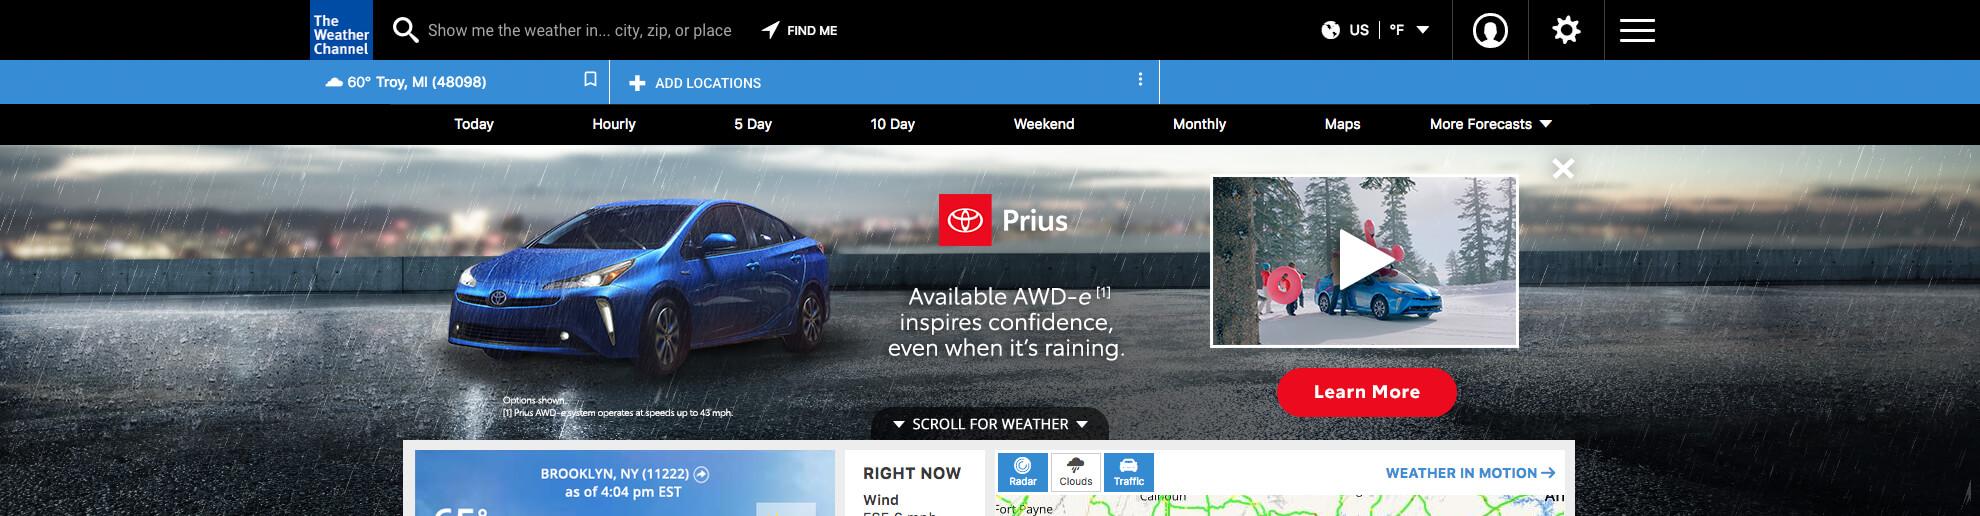 ToyotaPrius_DWB_0008_Rainy Day Open